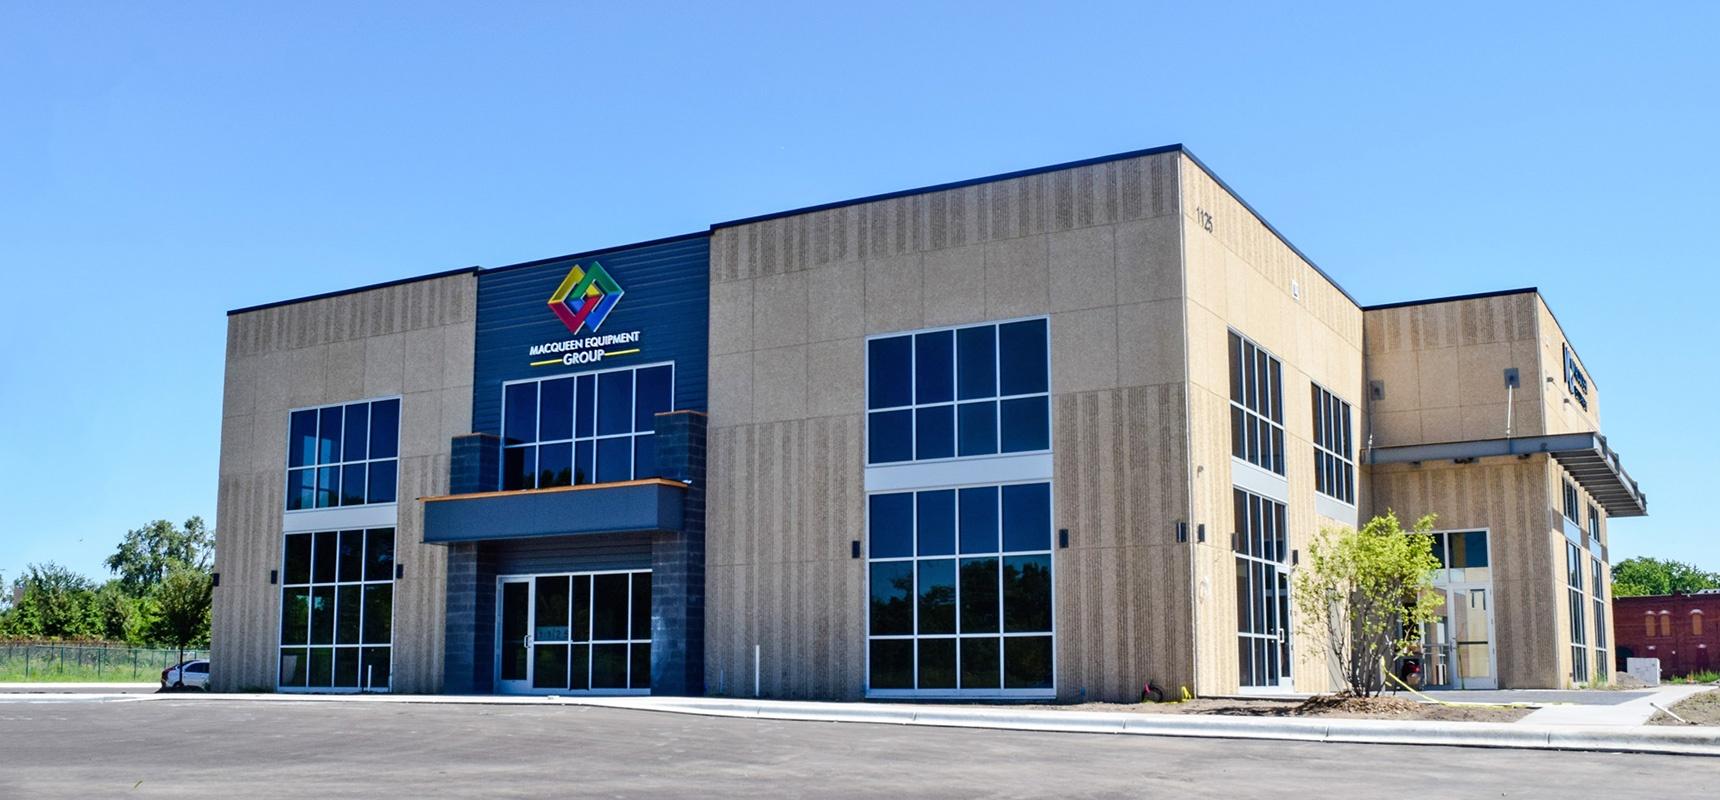 Pierce Names MacQueen Emergency Group Its New Dealer In Minnesota, Nebraska  And The Dakotas